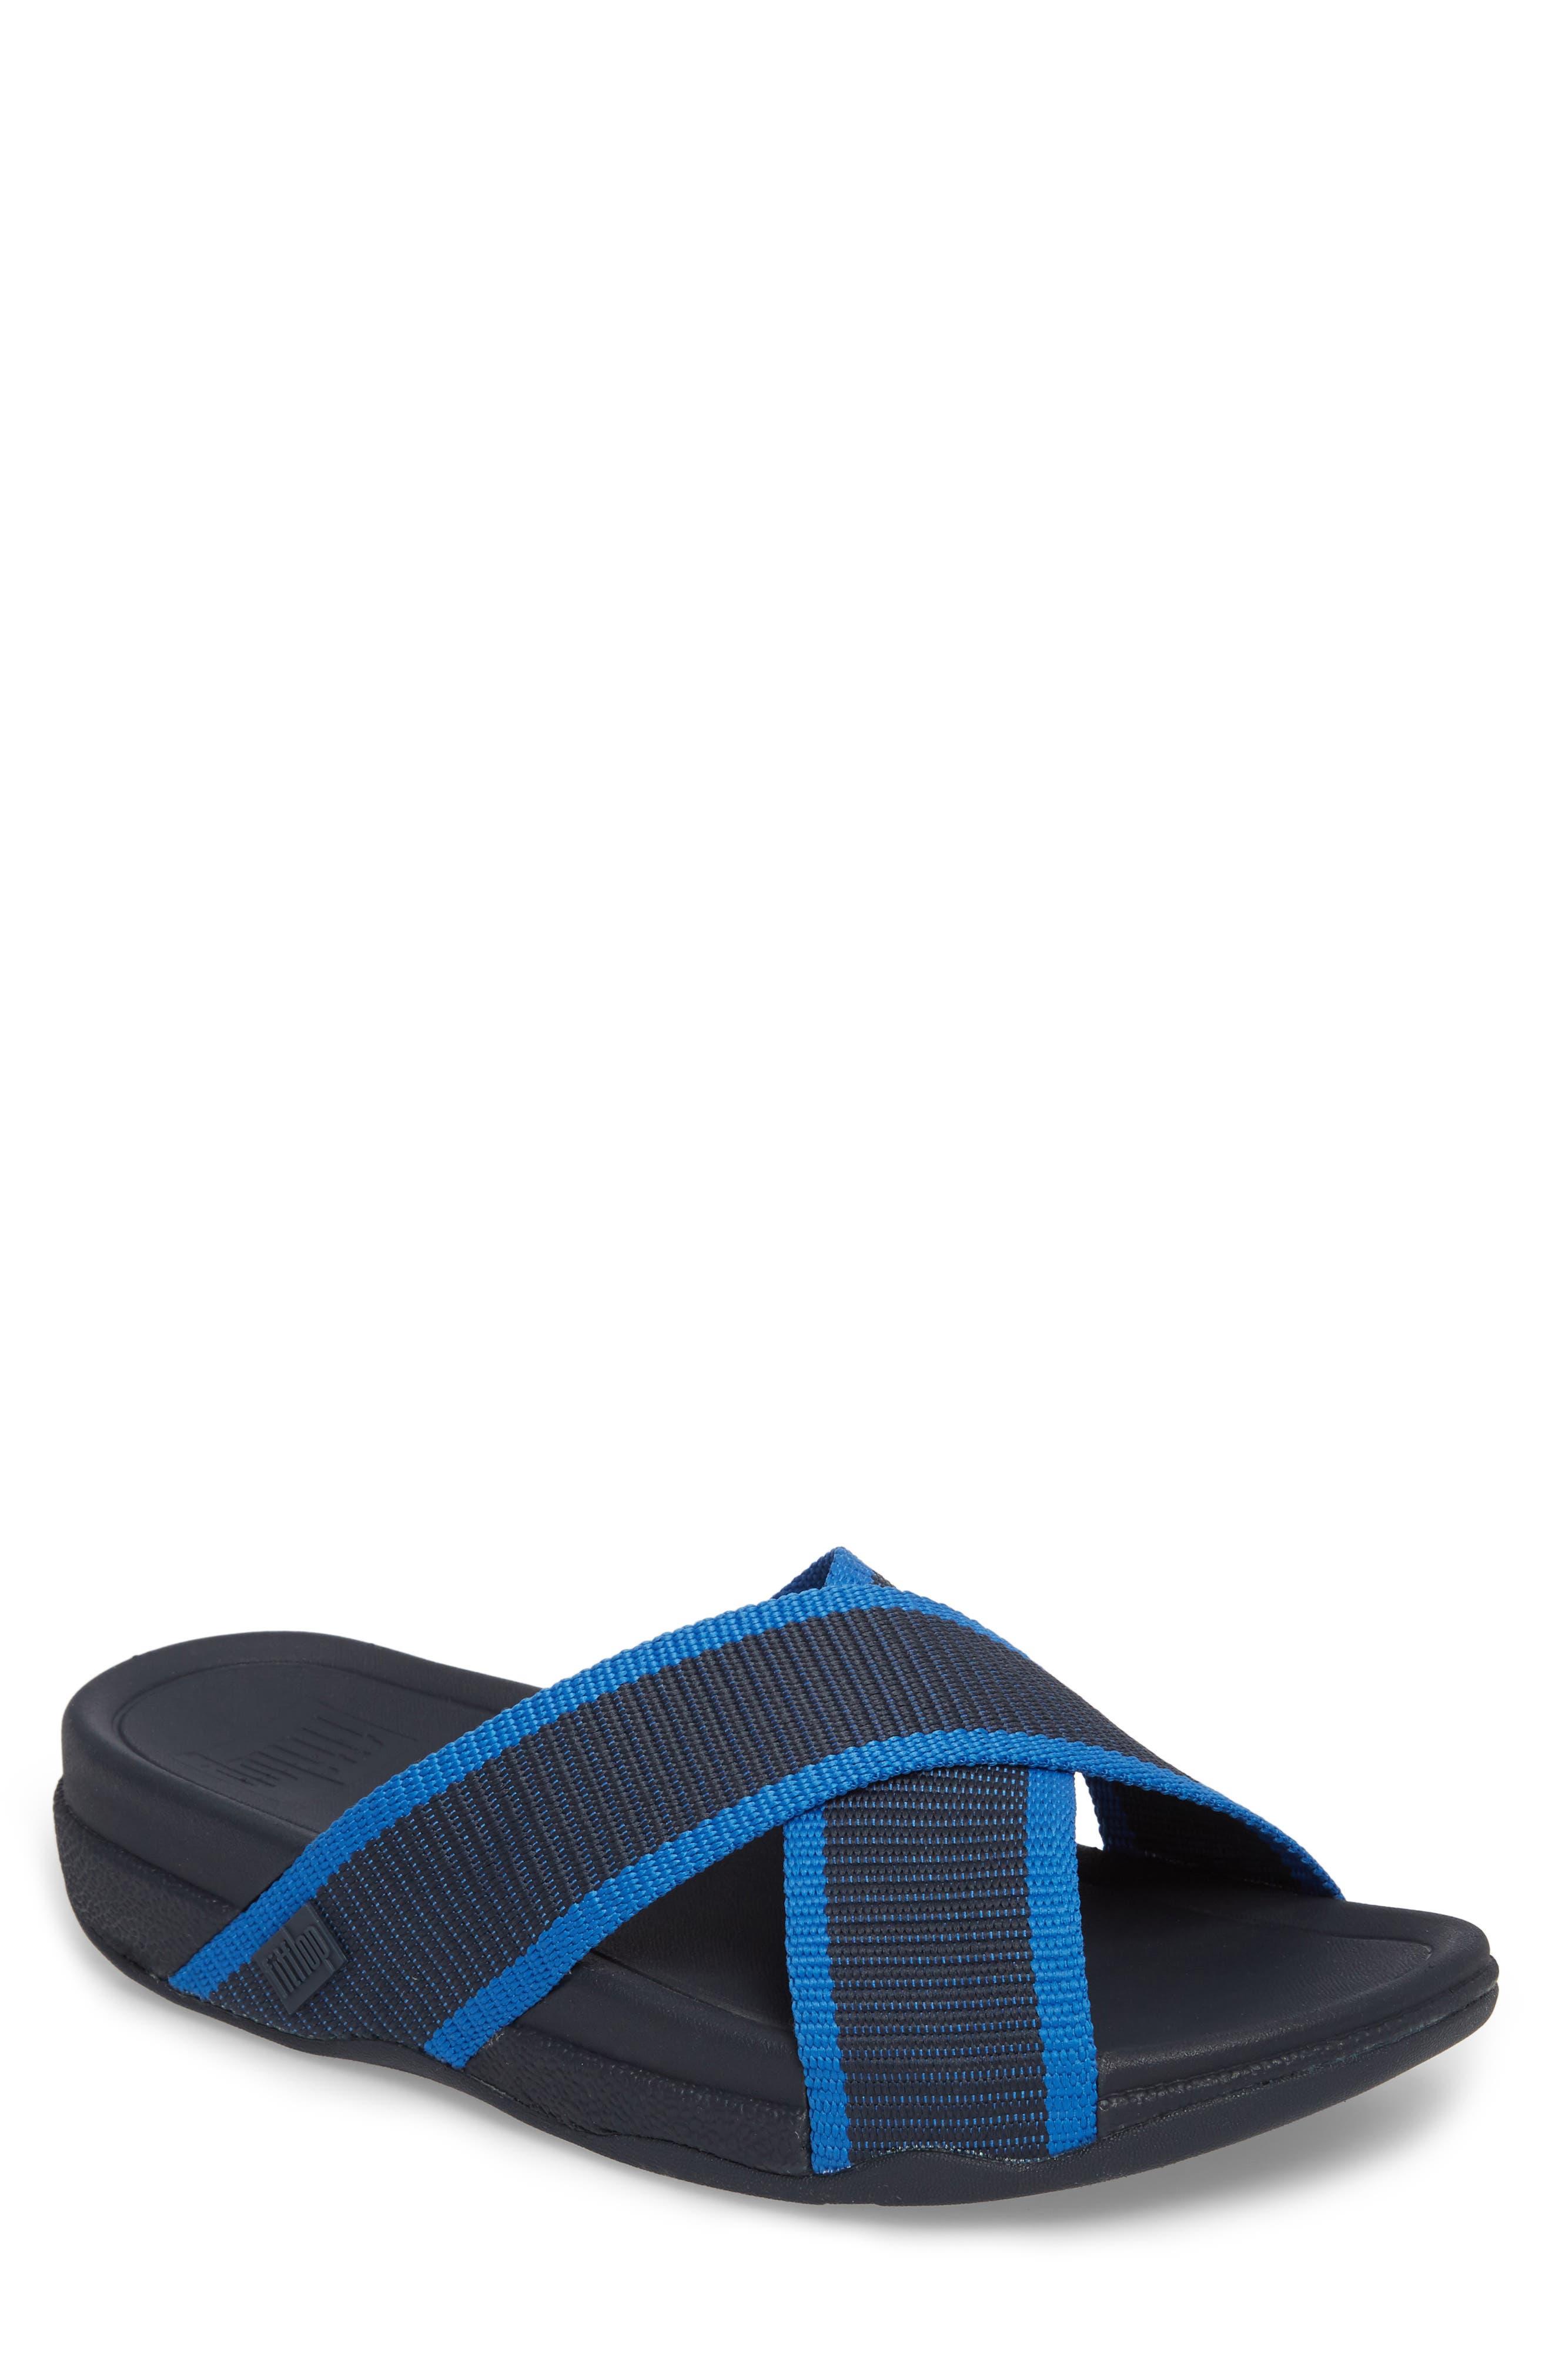 Surfer Slide Sandal,                             Main thumbnail 1, color,                             SUPERNAVY BLUE